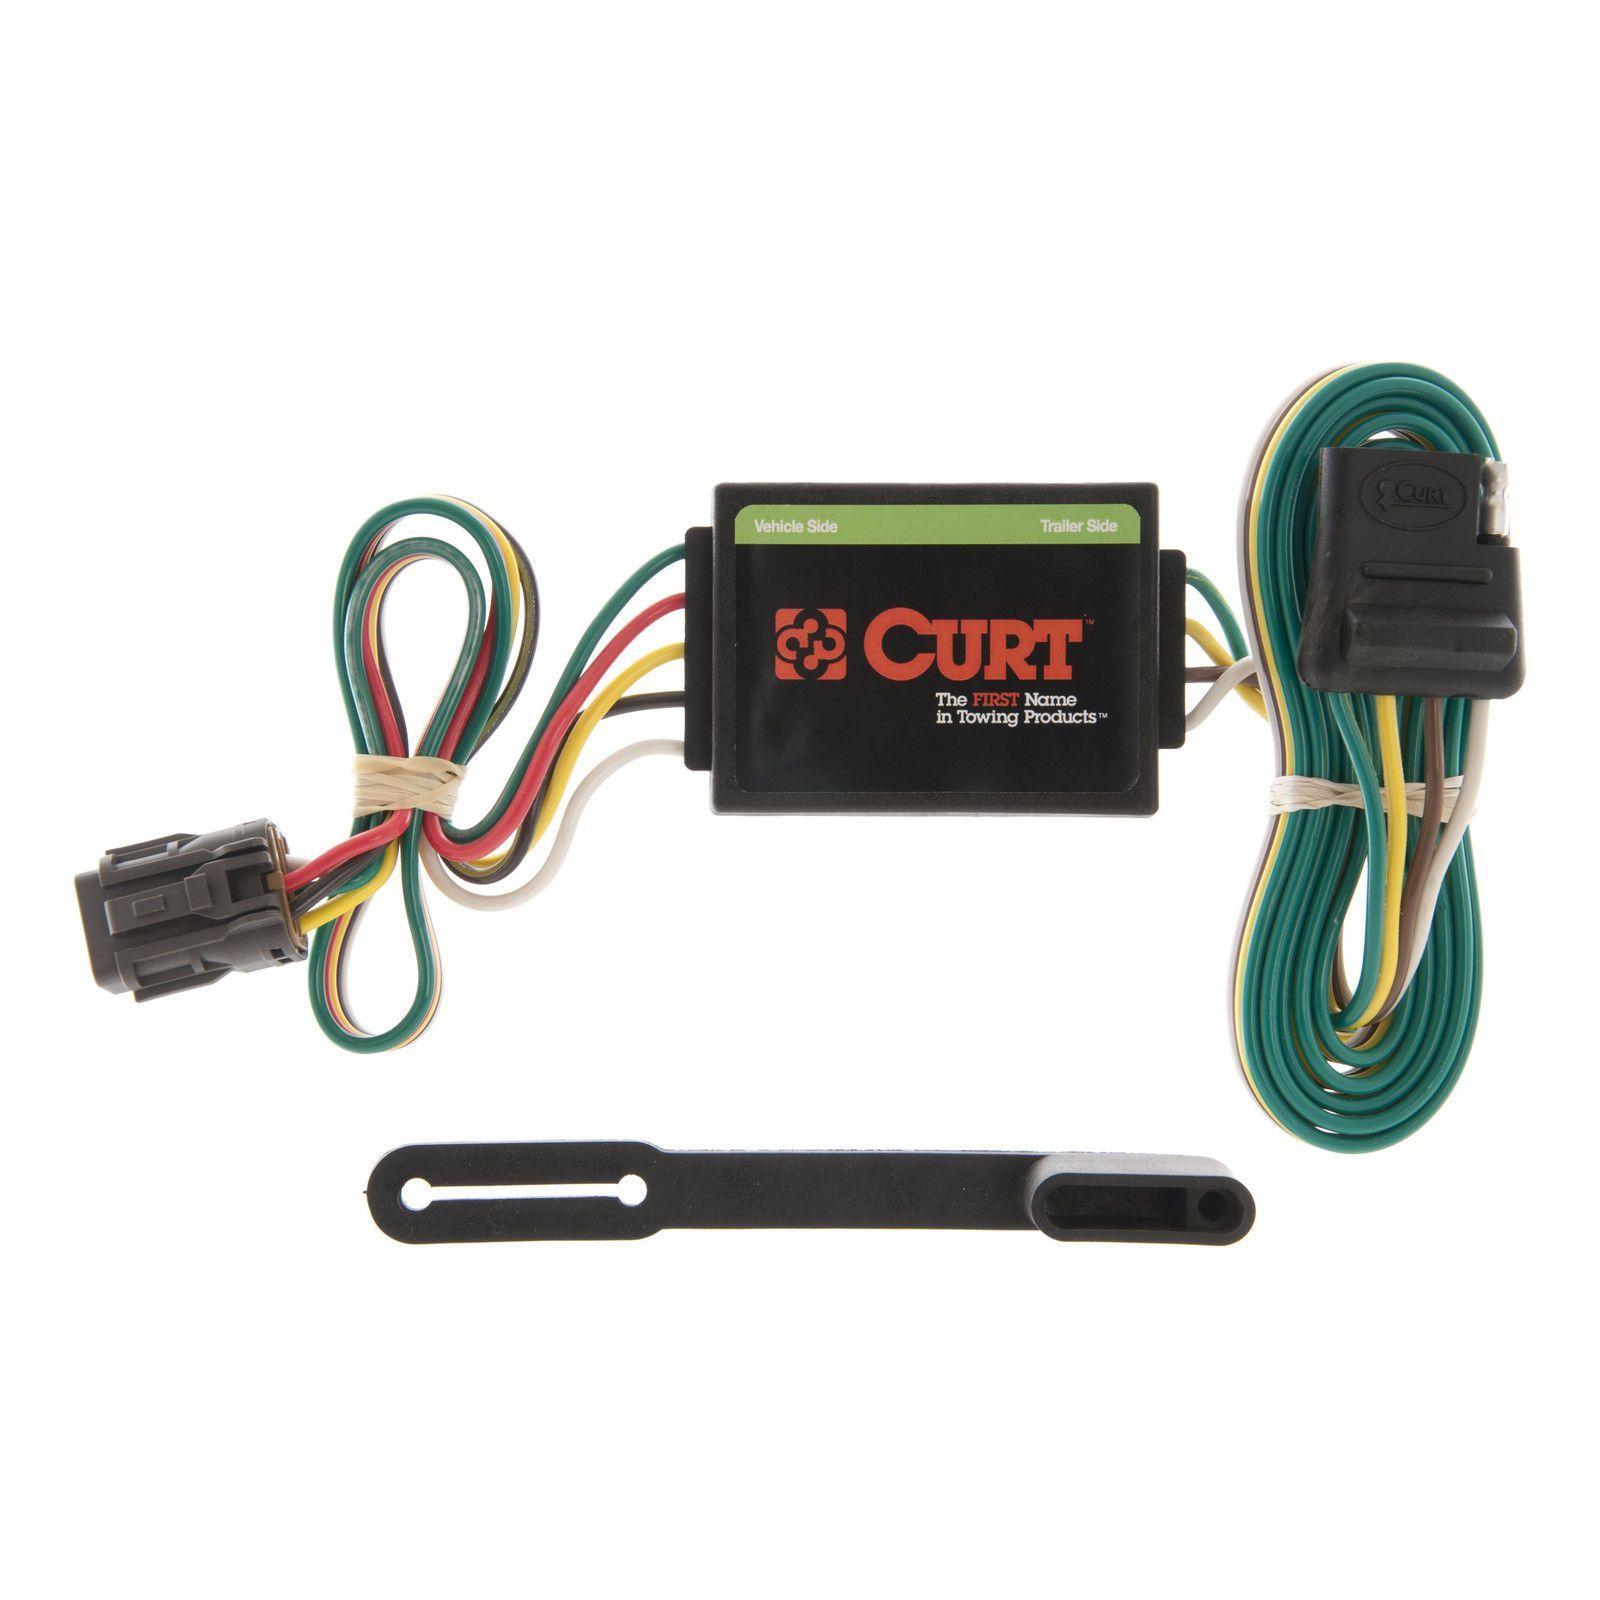 Curt 55331 Wiring Connector For 94-97 Honda Passport, 92-97 Isuzu Rodeo